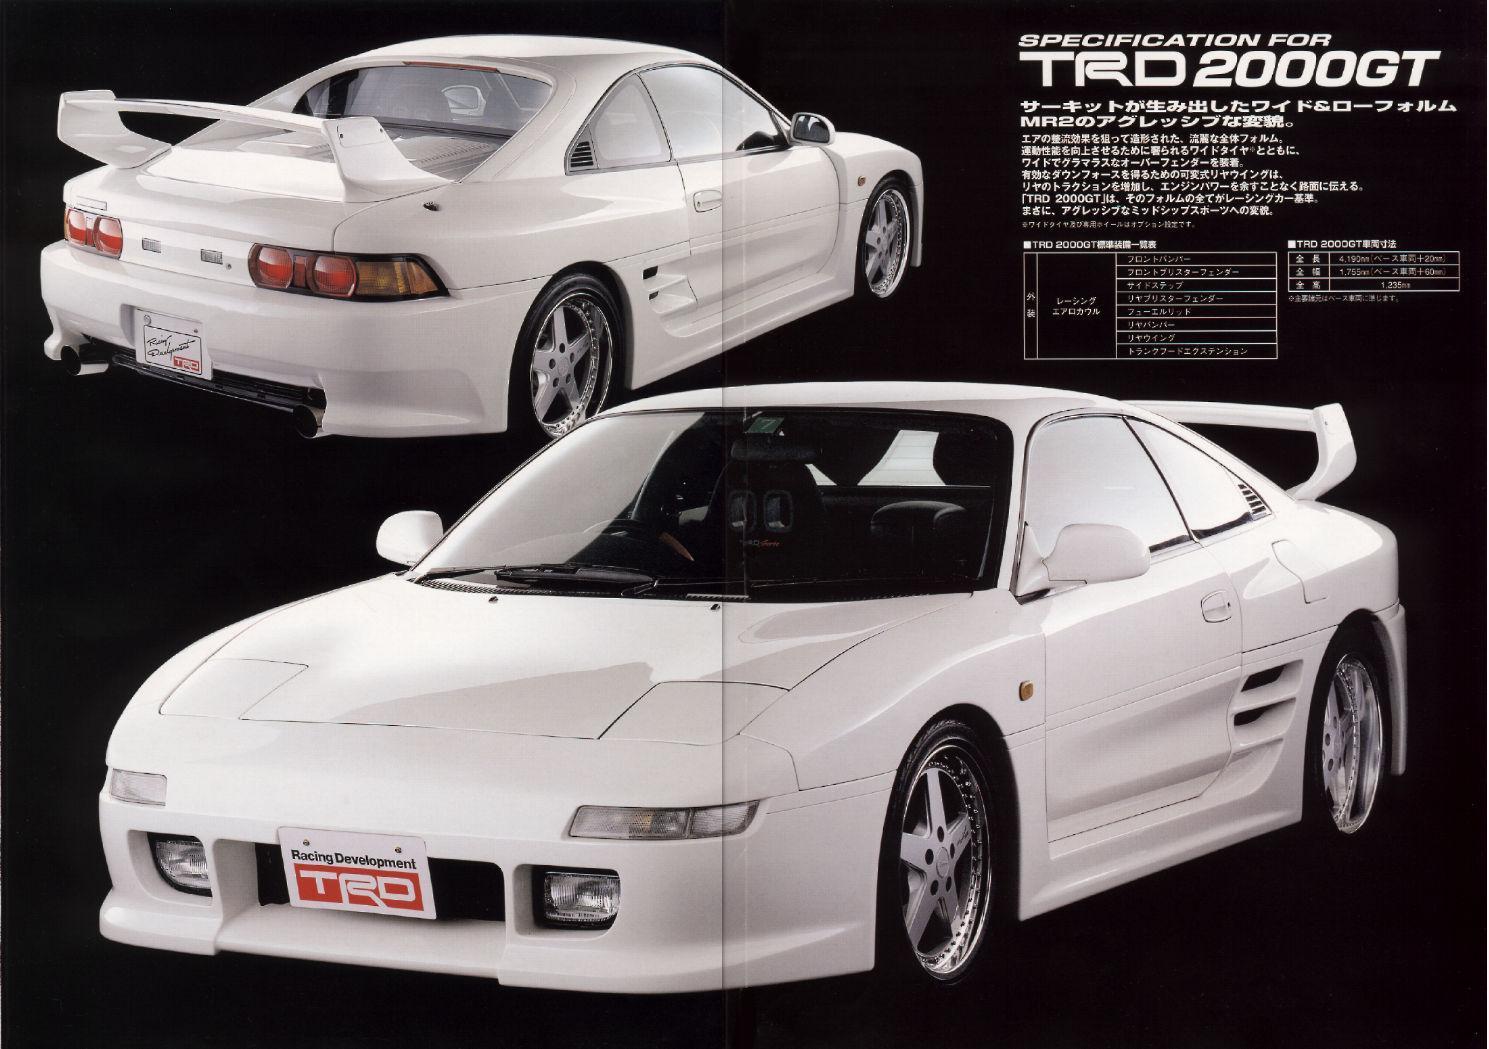 Trd 2000gt 1998